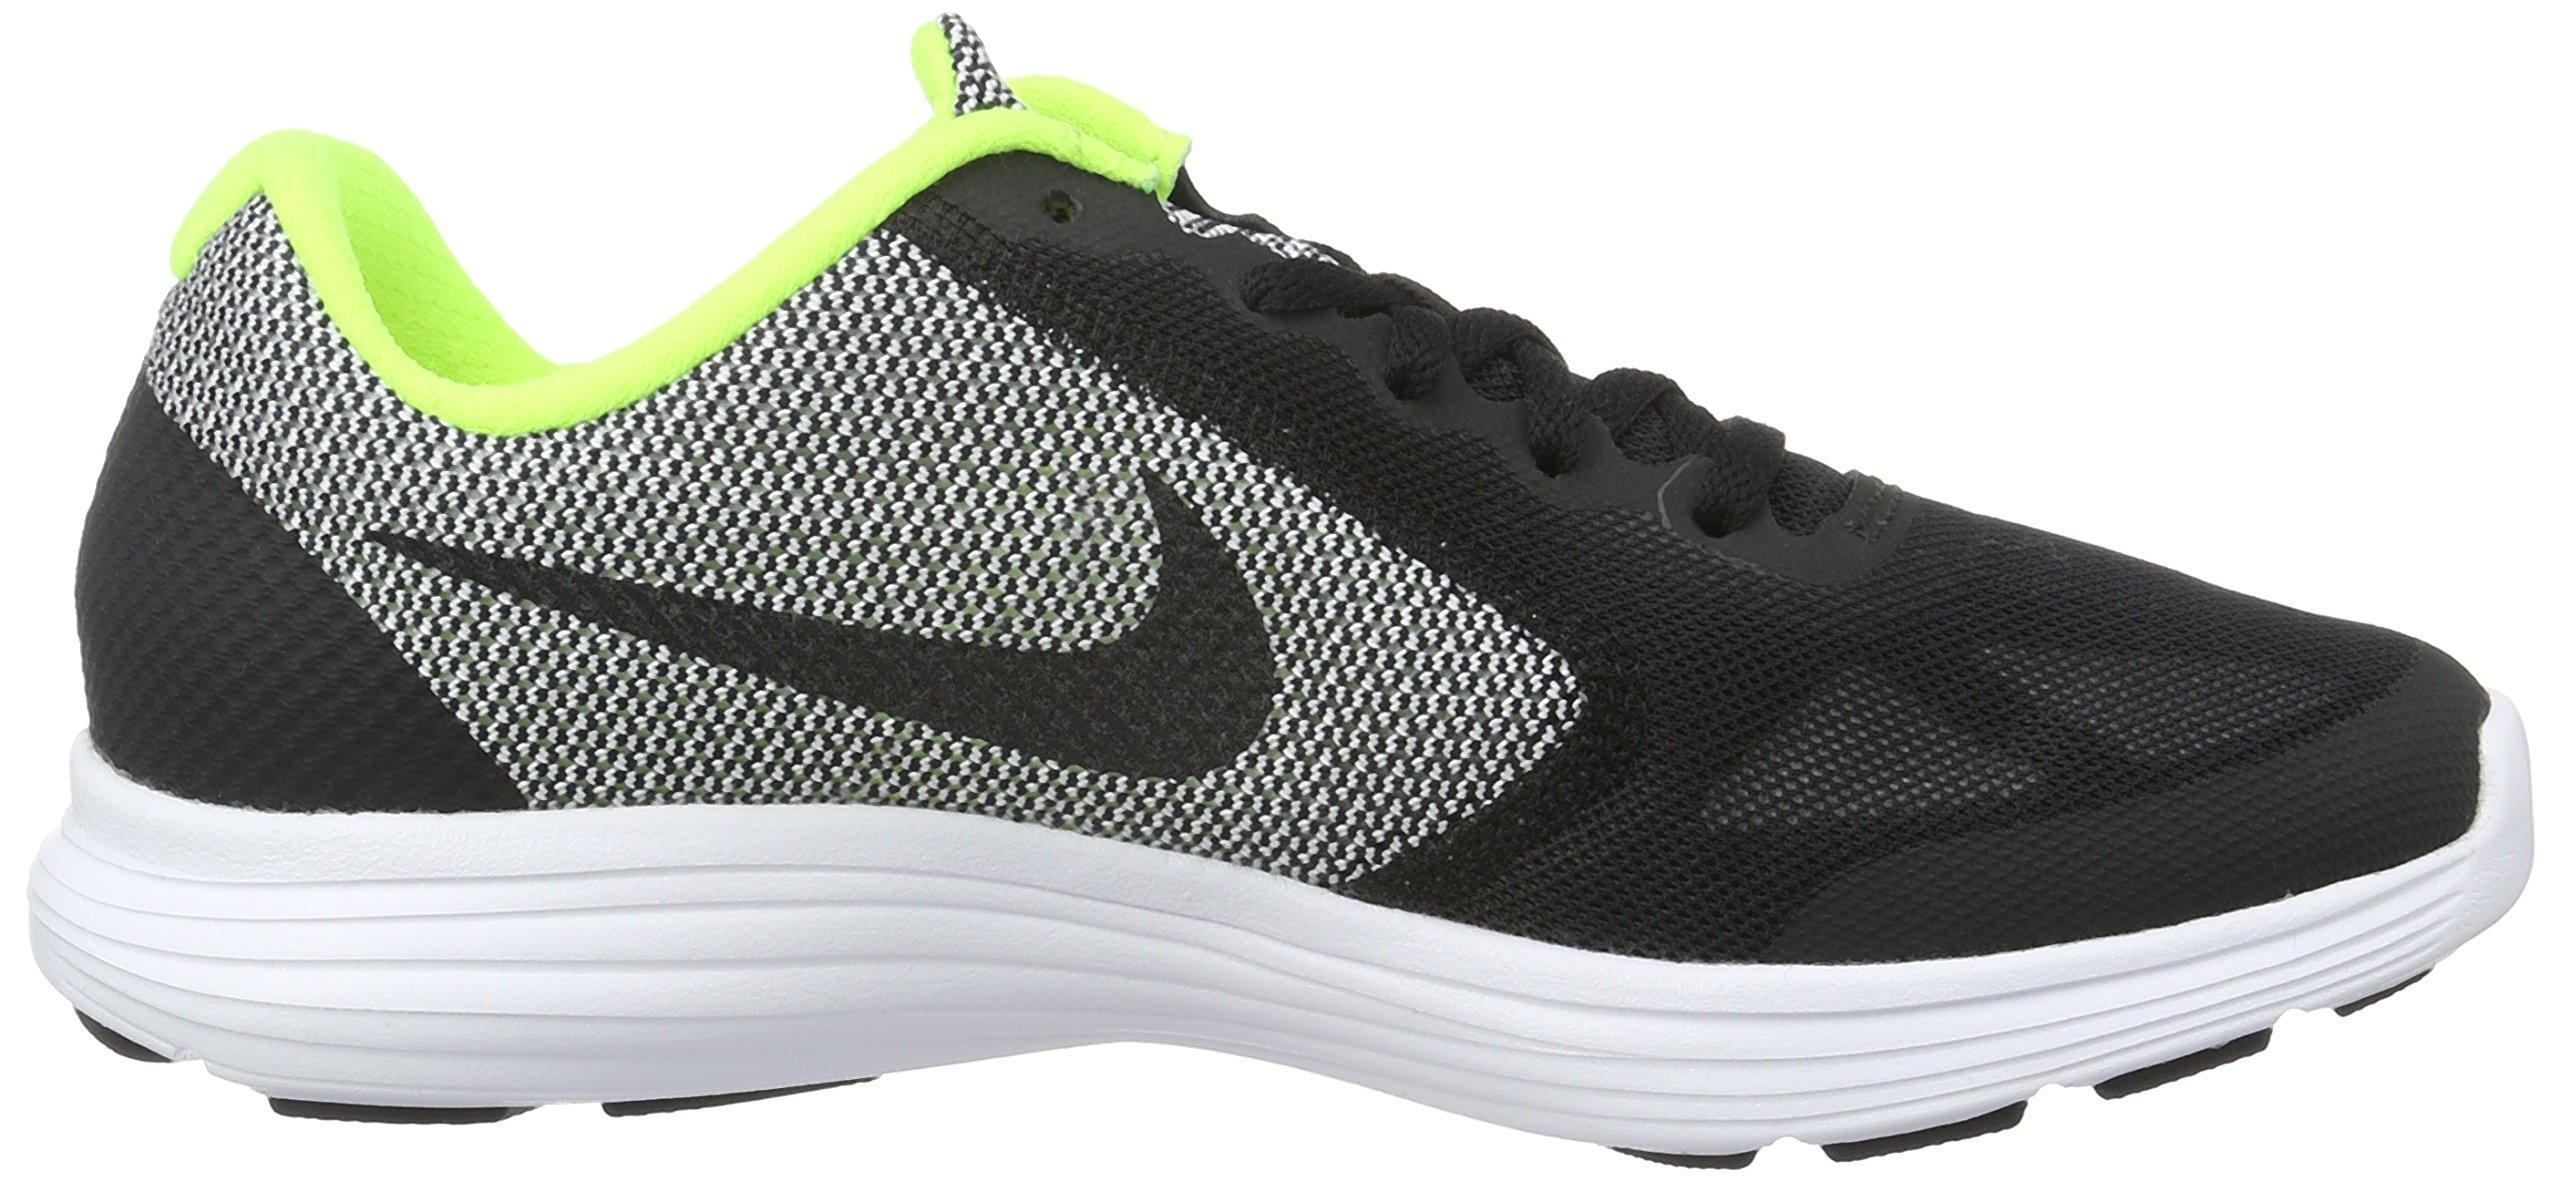 Nike Boys' Revolution 3 (GS) Running Shoe Black/White/Volt, 4.5 M US Big Kid by Nike (Image #6)